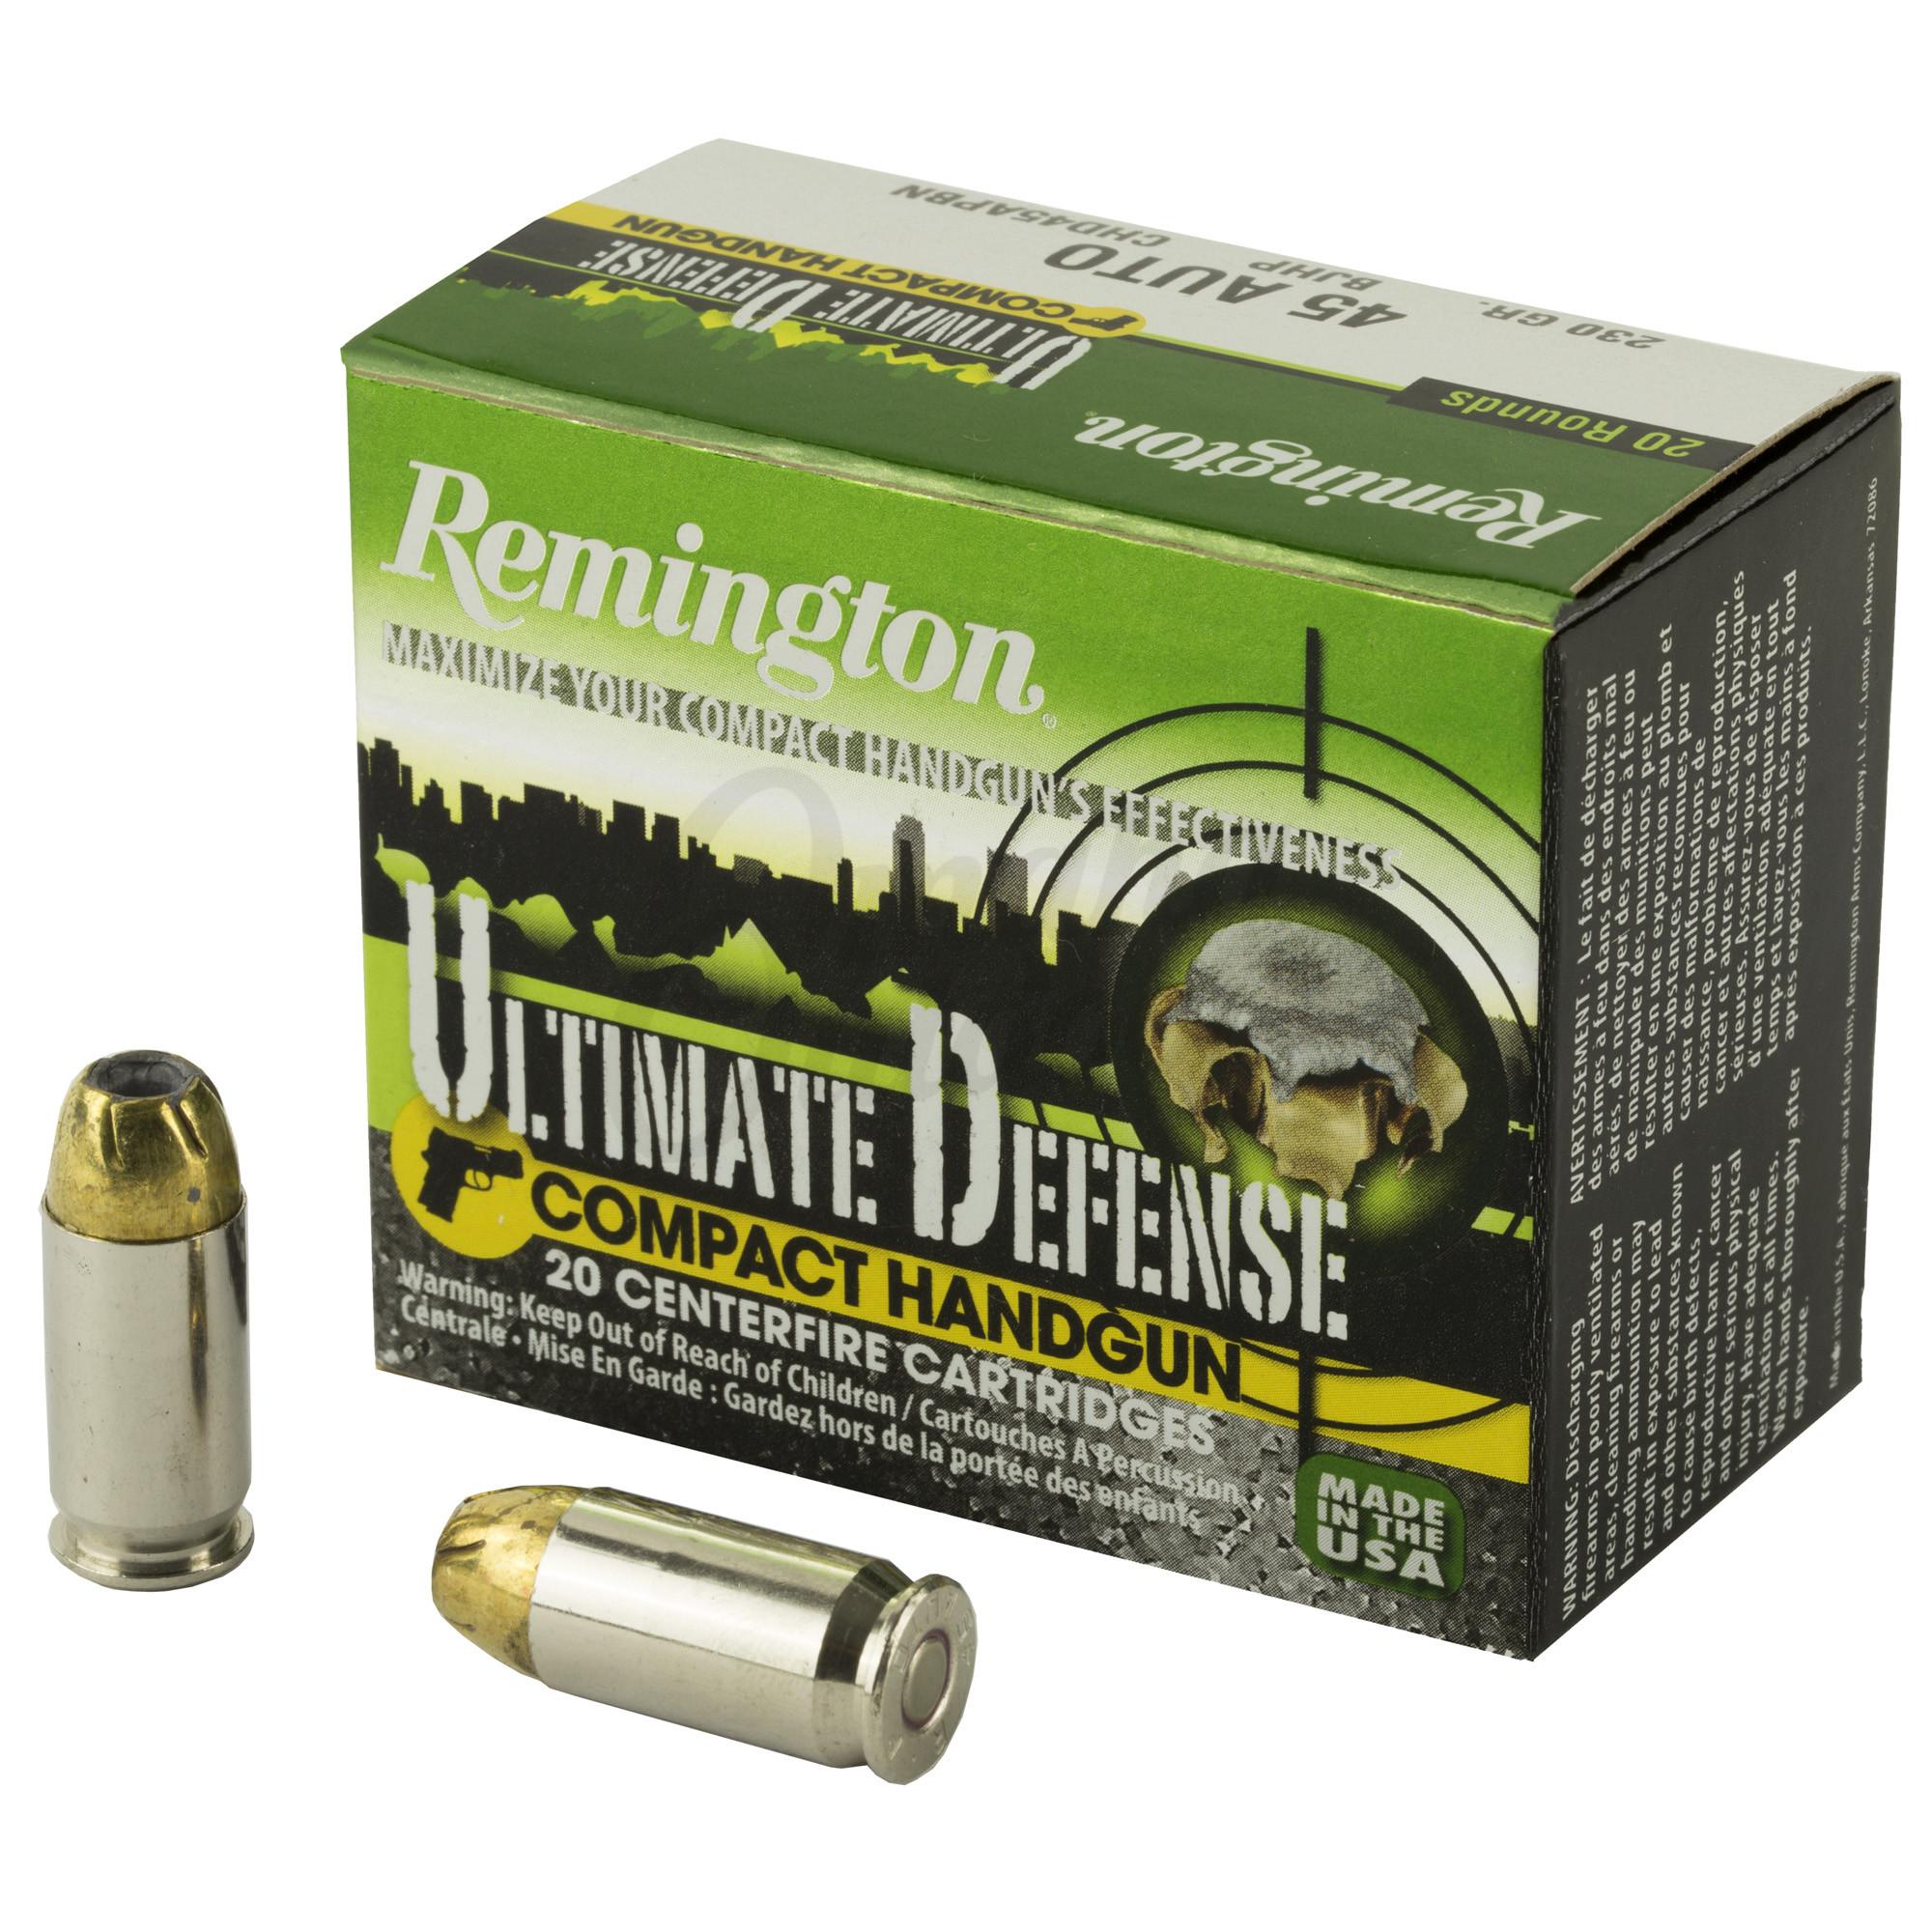 Remington Ultimate Defense Compact 45 ACP Ammo 230 Grain Brass JHP 20 Round  Box 28967